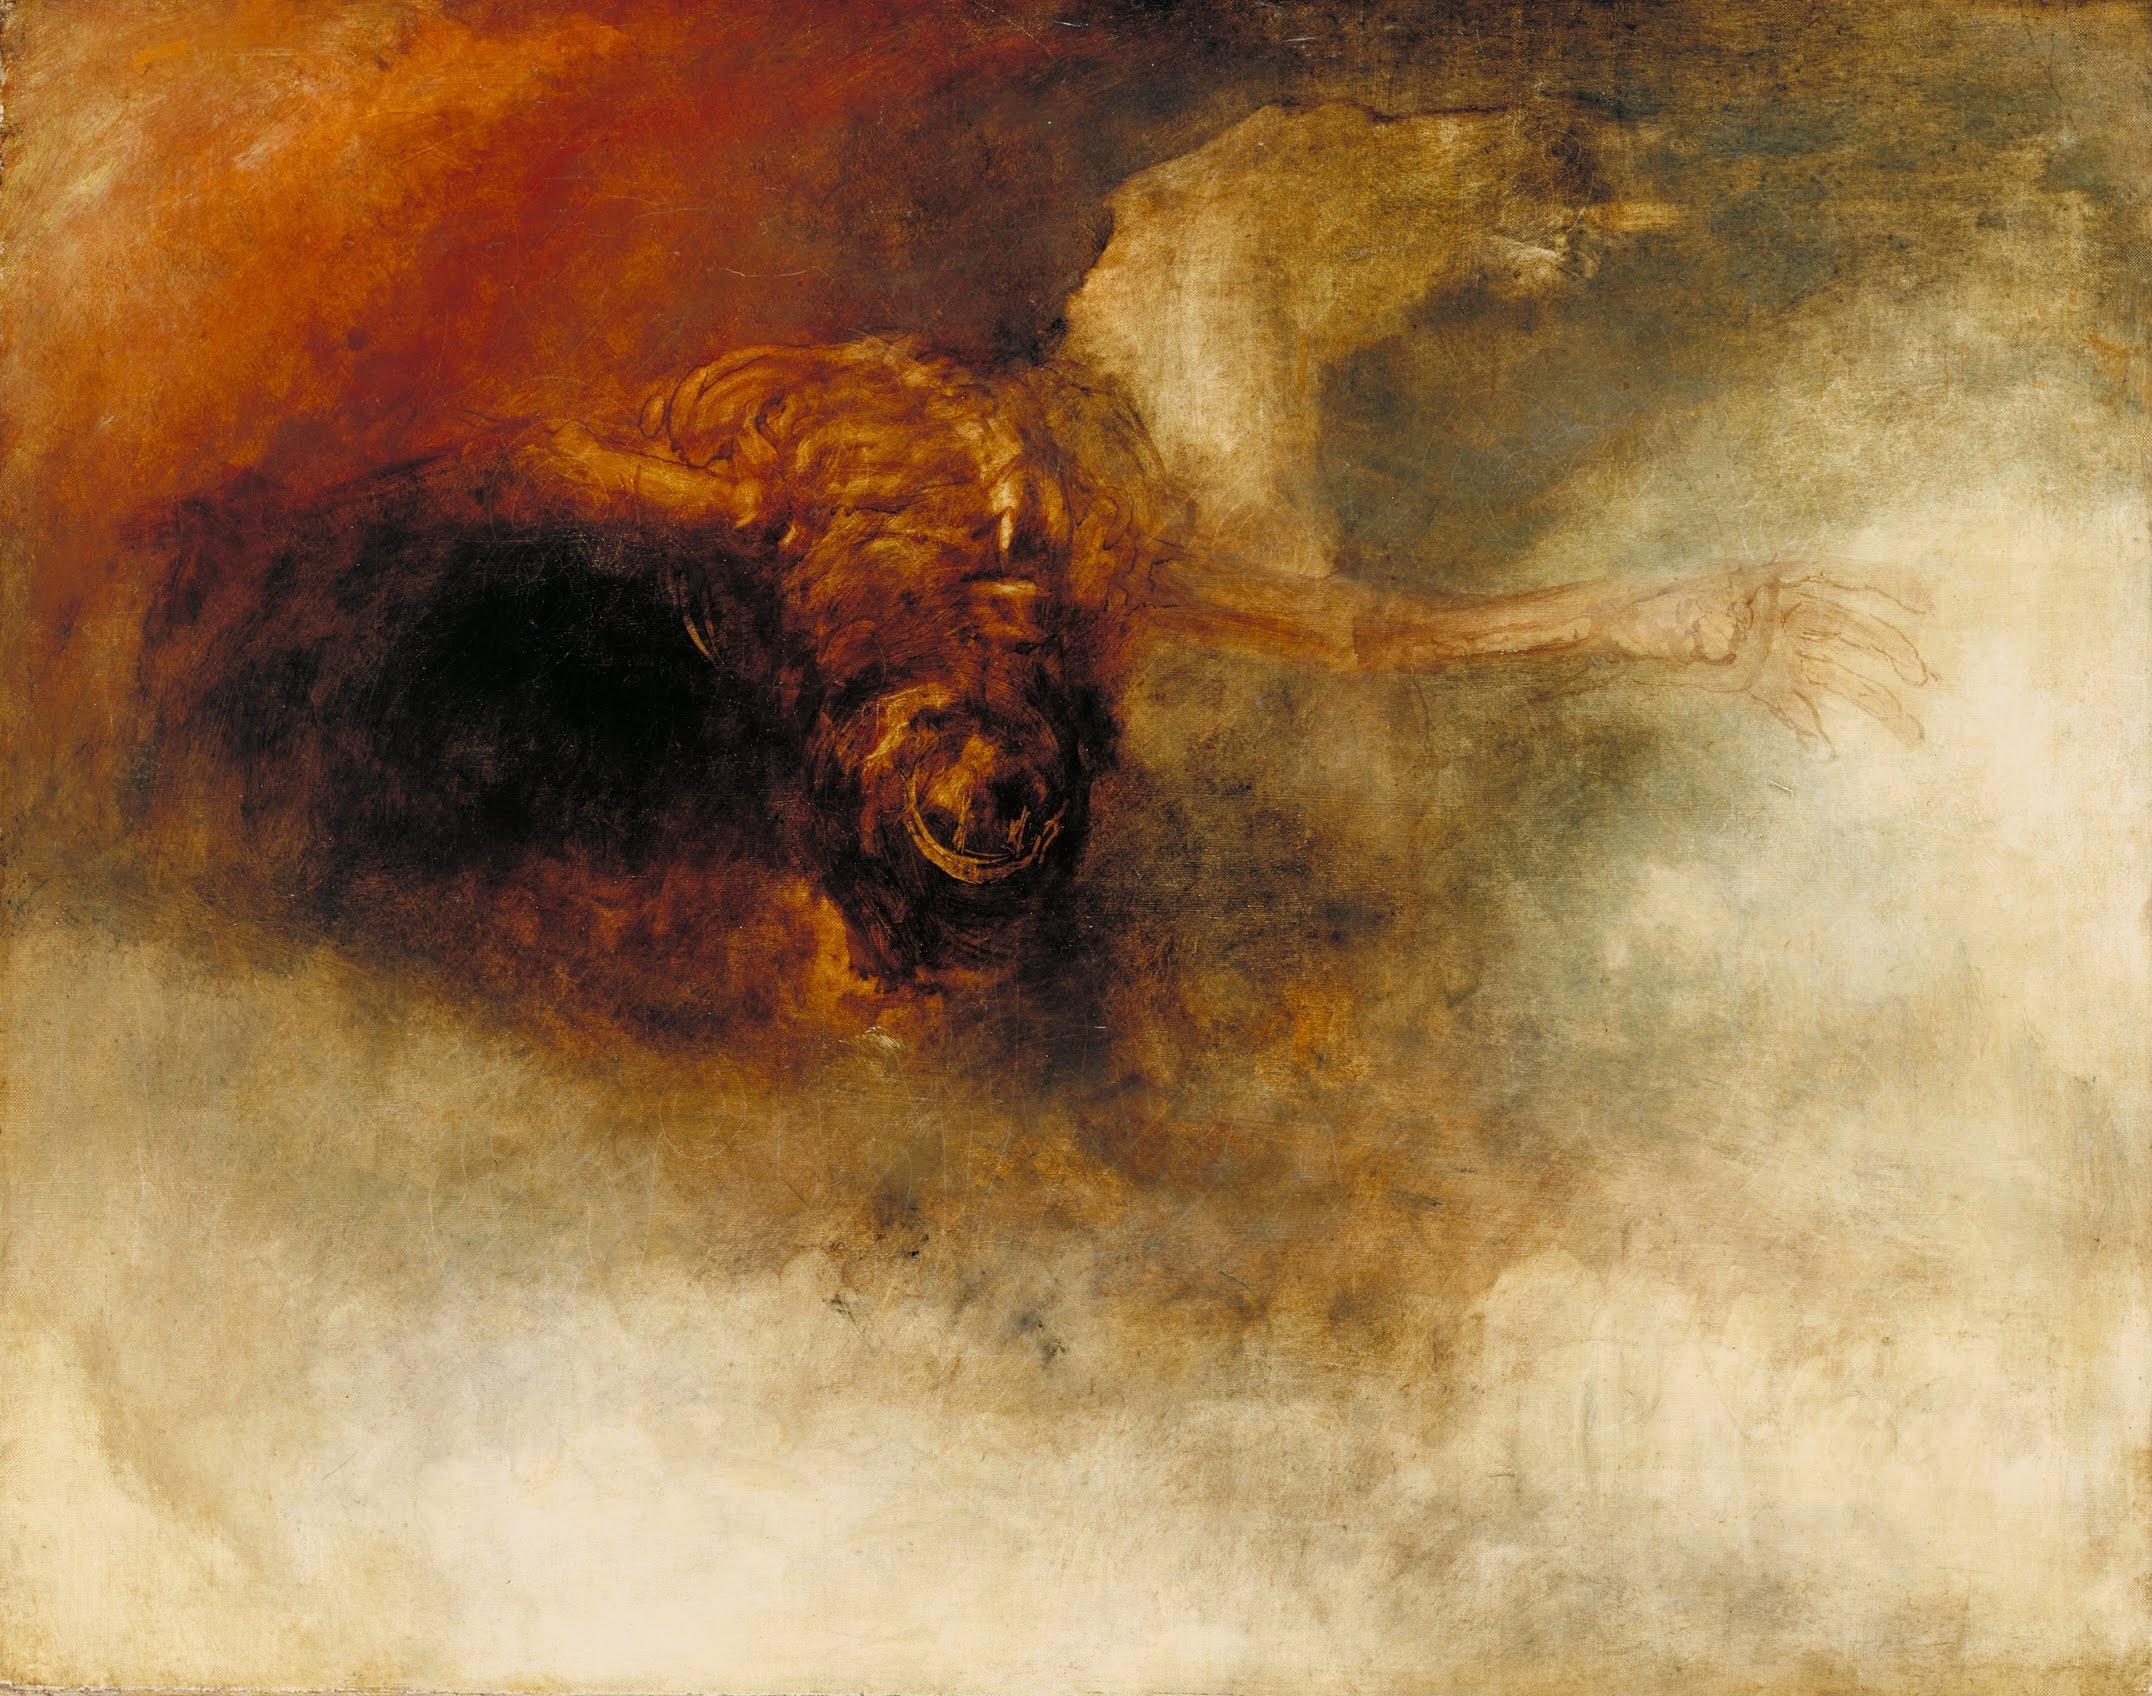 Joseph_Mallord_William_Turner_-_Death_on_a_pale_horse_-_Google_Art_Project